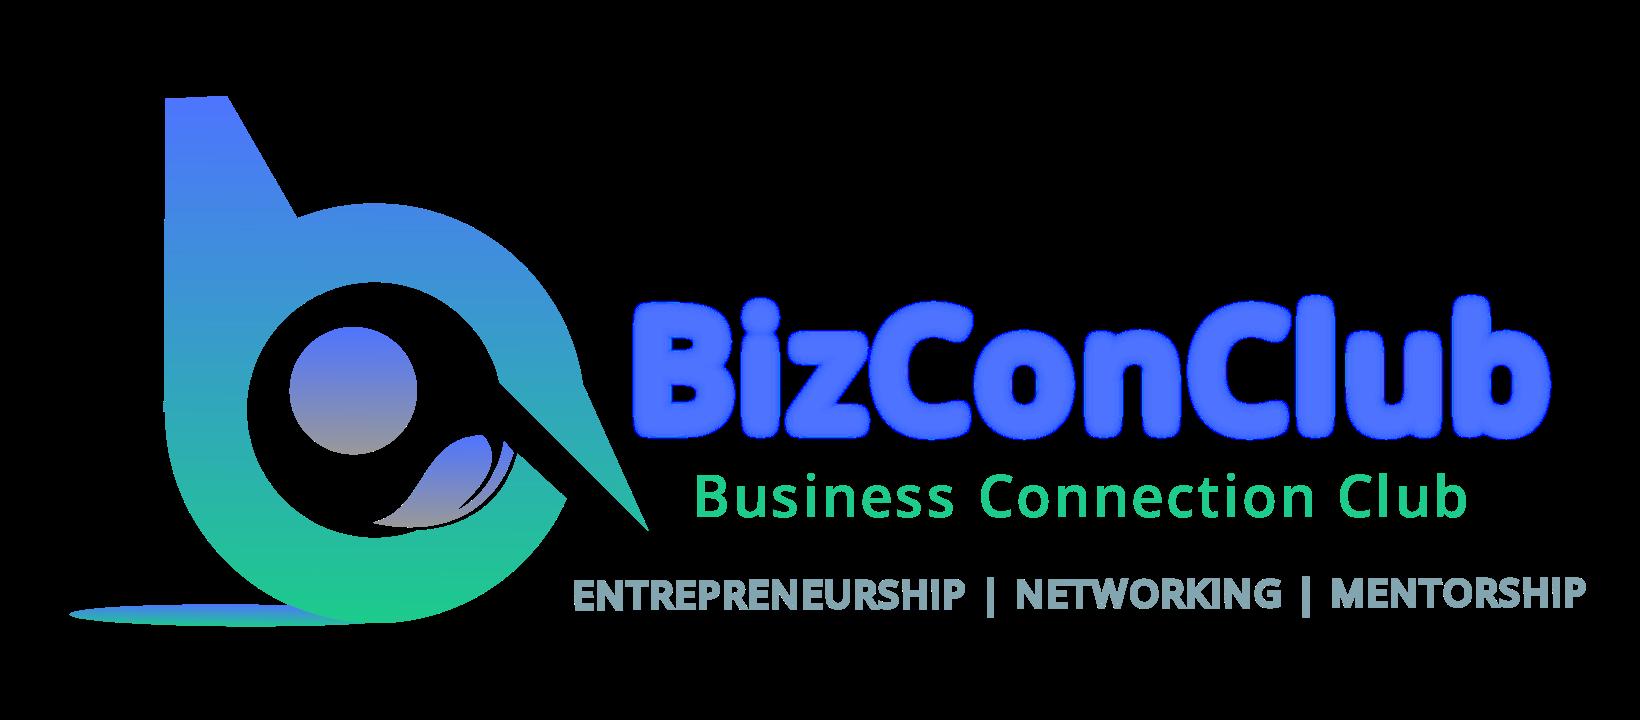 BizCon Logo 1640 x 720 - Docs, Email, Website.png